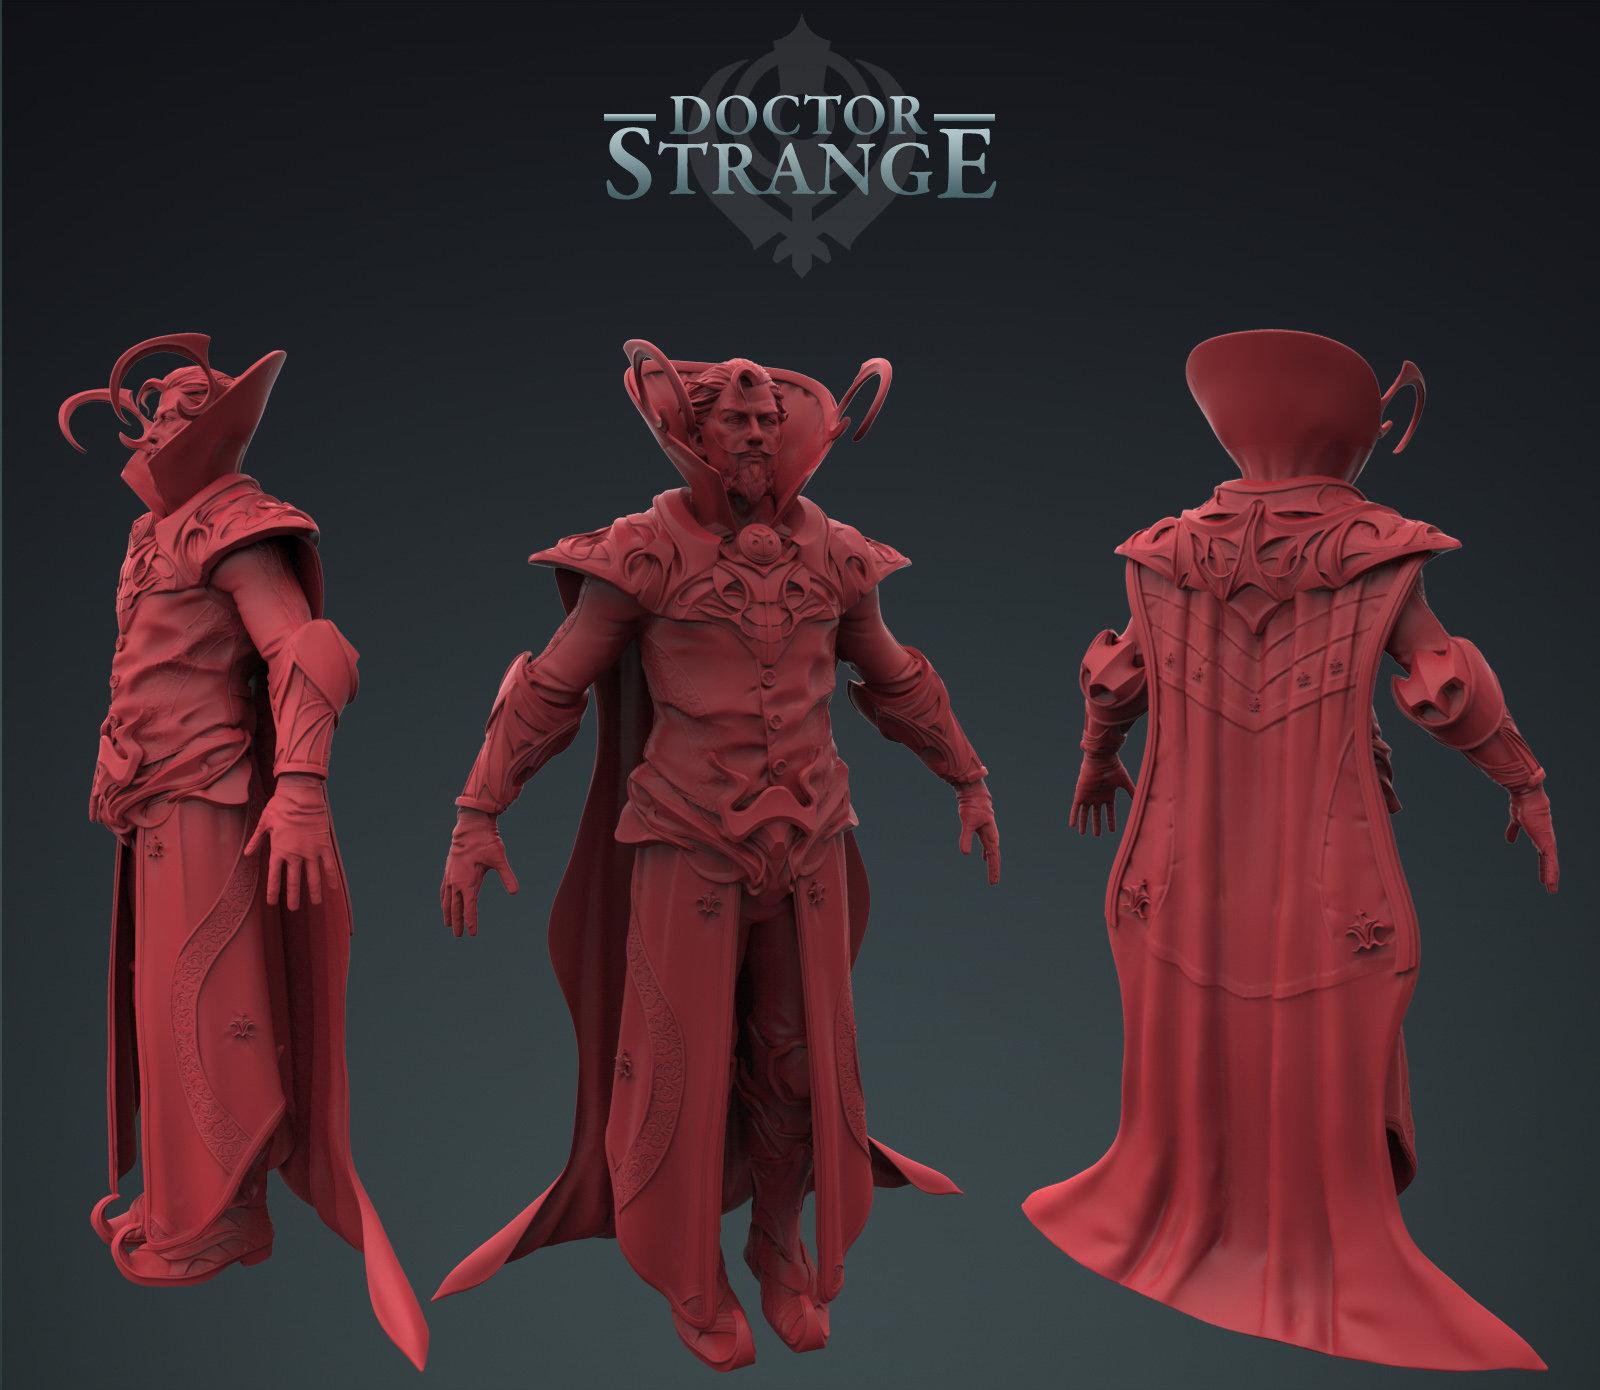 Comicon Challenge 2014 - Doctor Strange